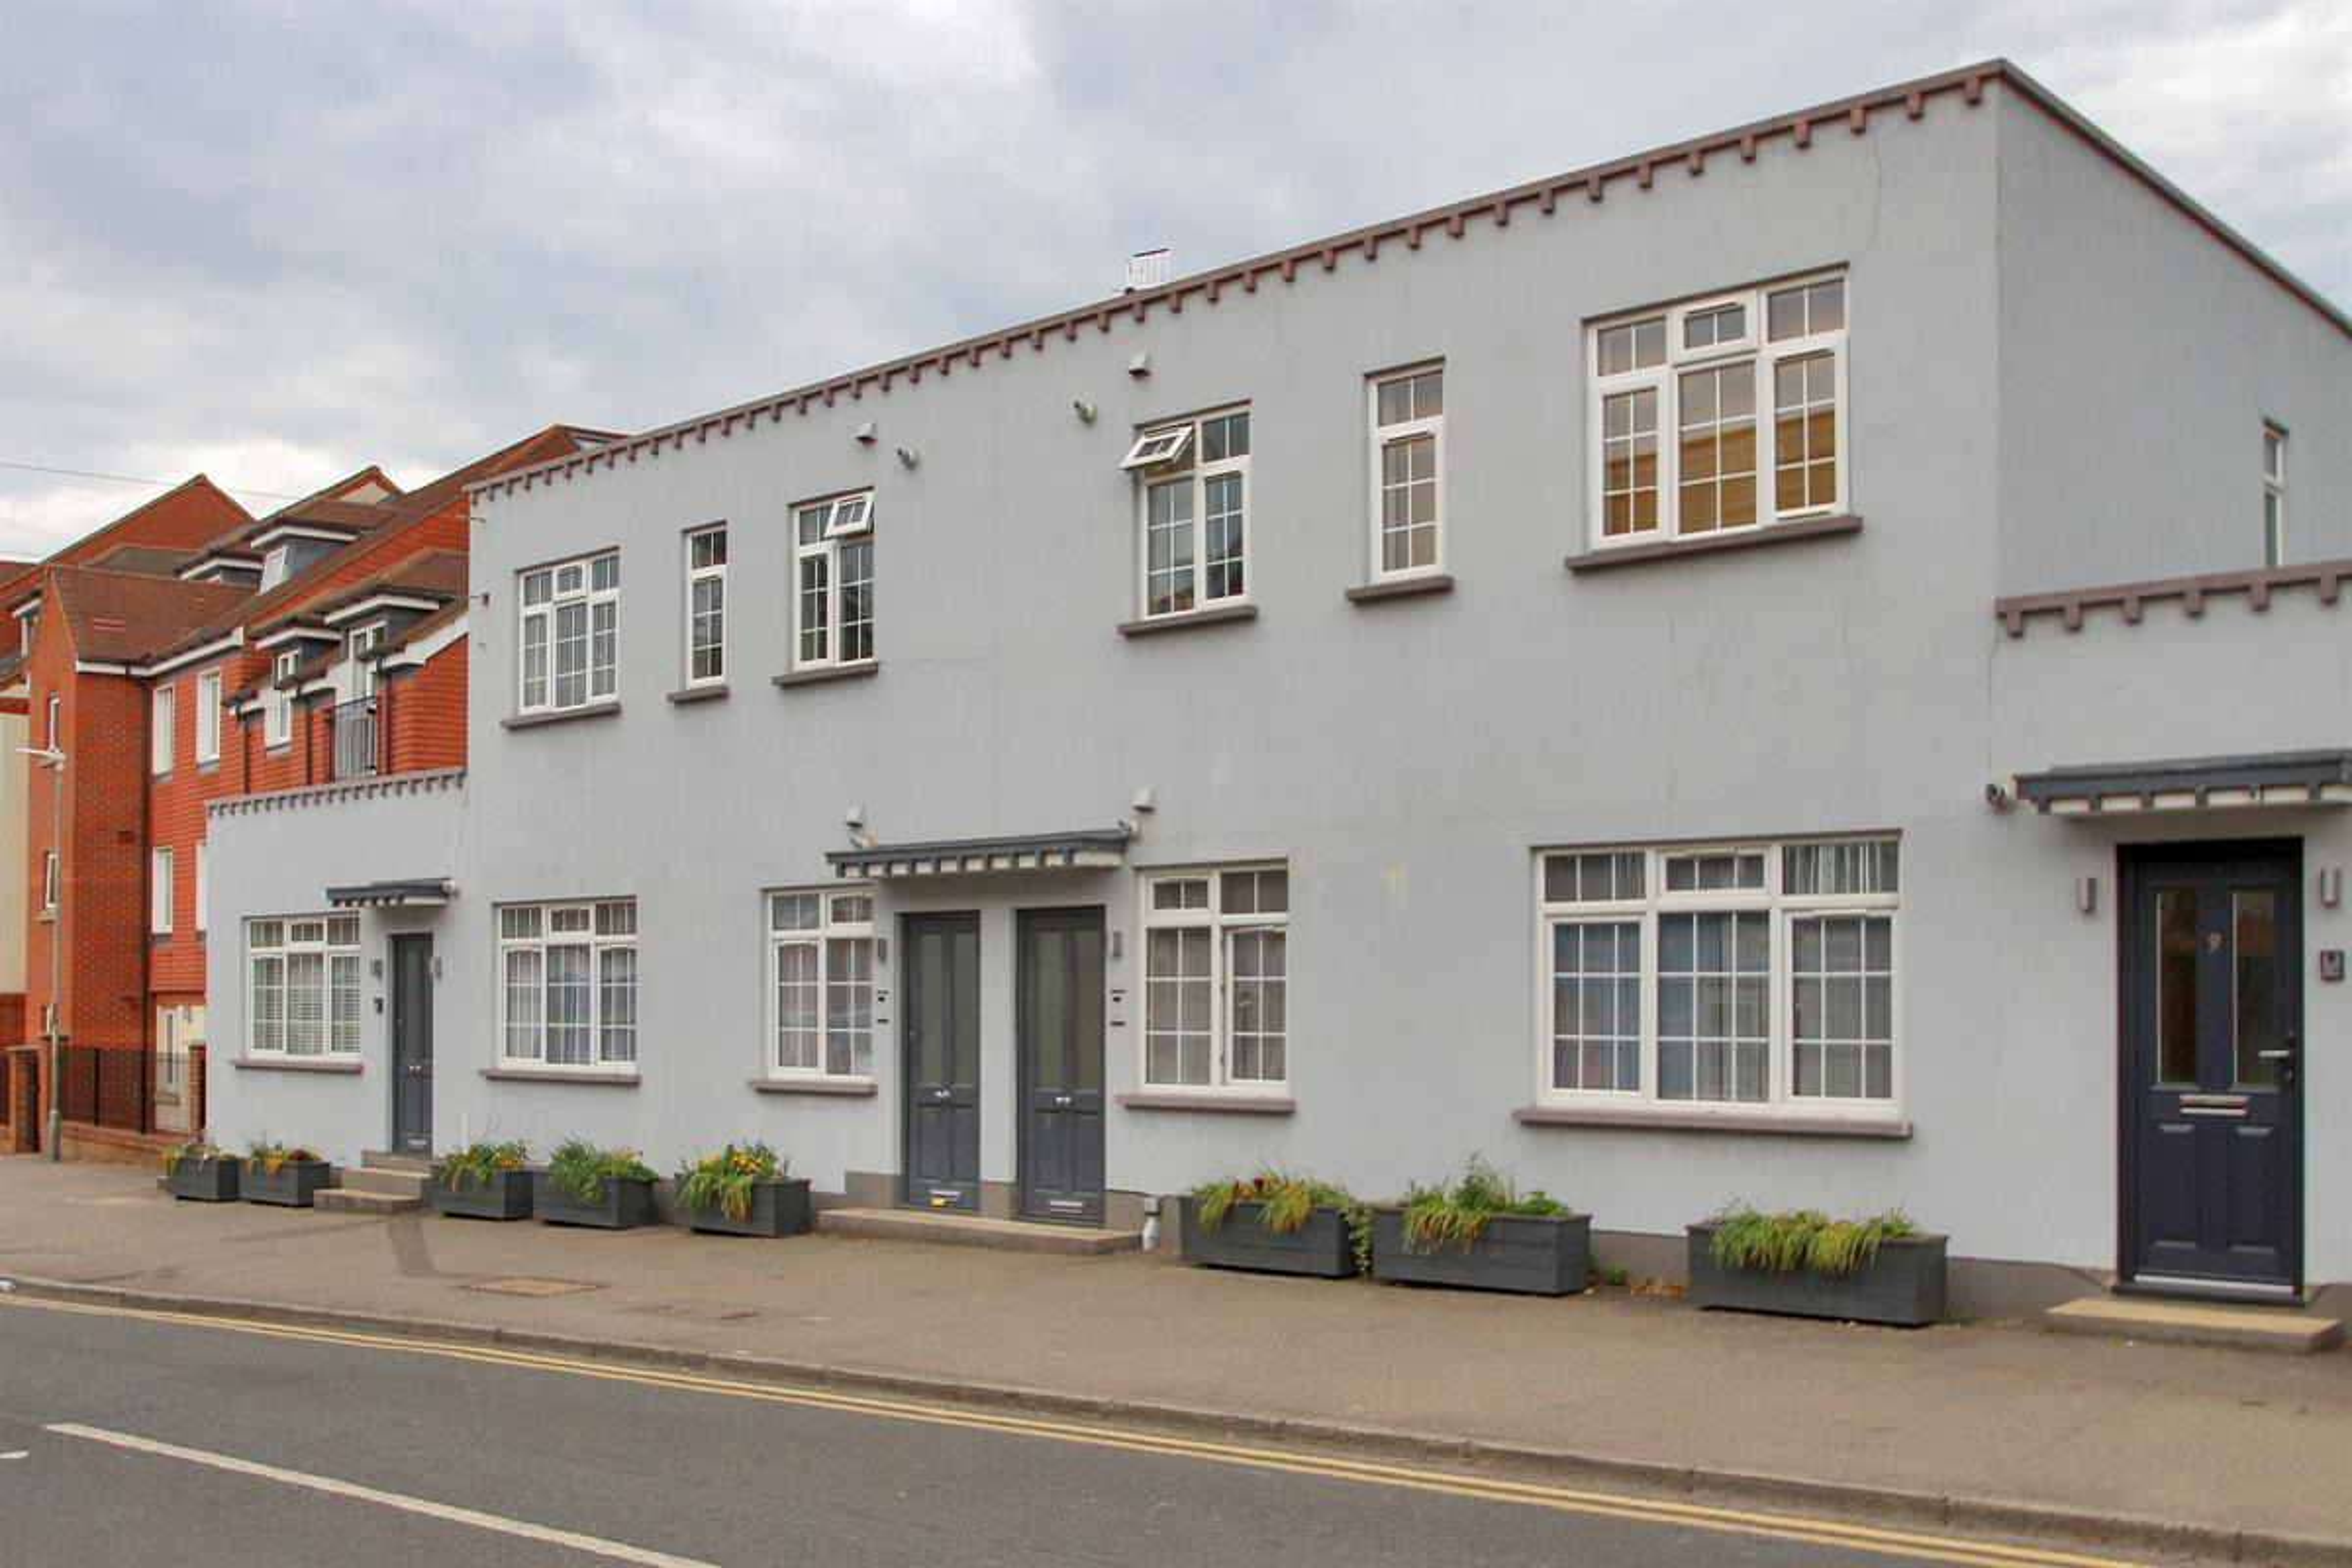 High Street, Edenbridge